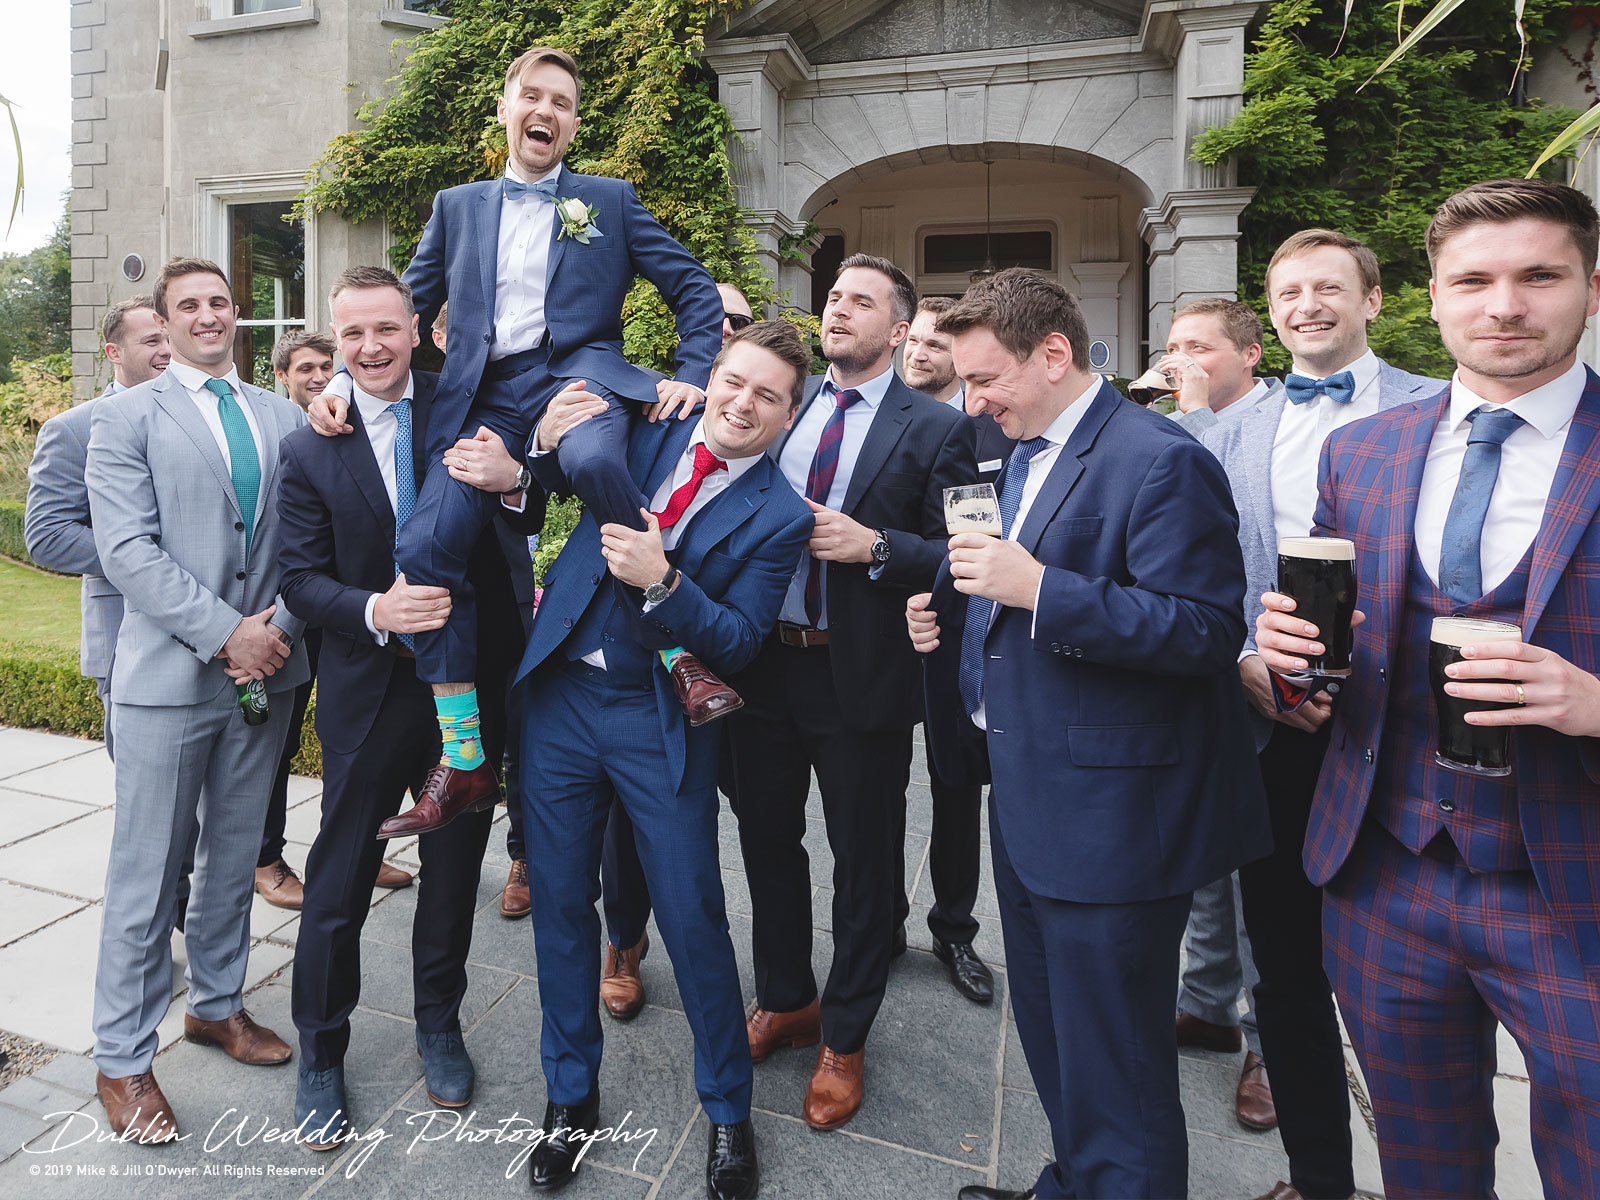 wedding-photographers-wicklow-tinakilly-house-2019-59.jpg